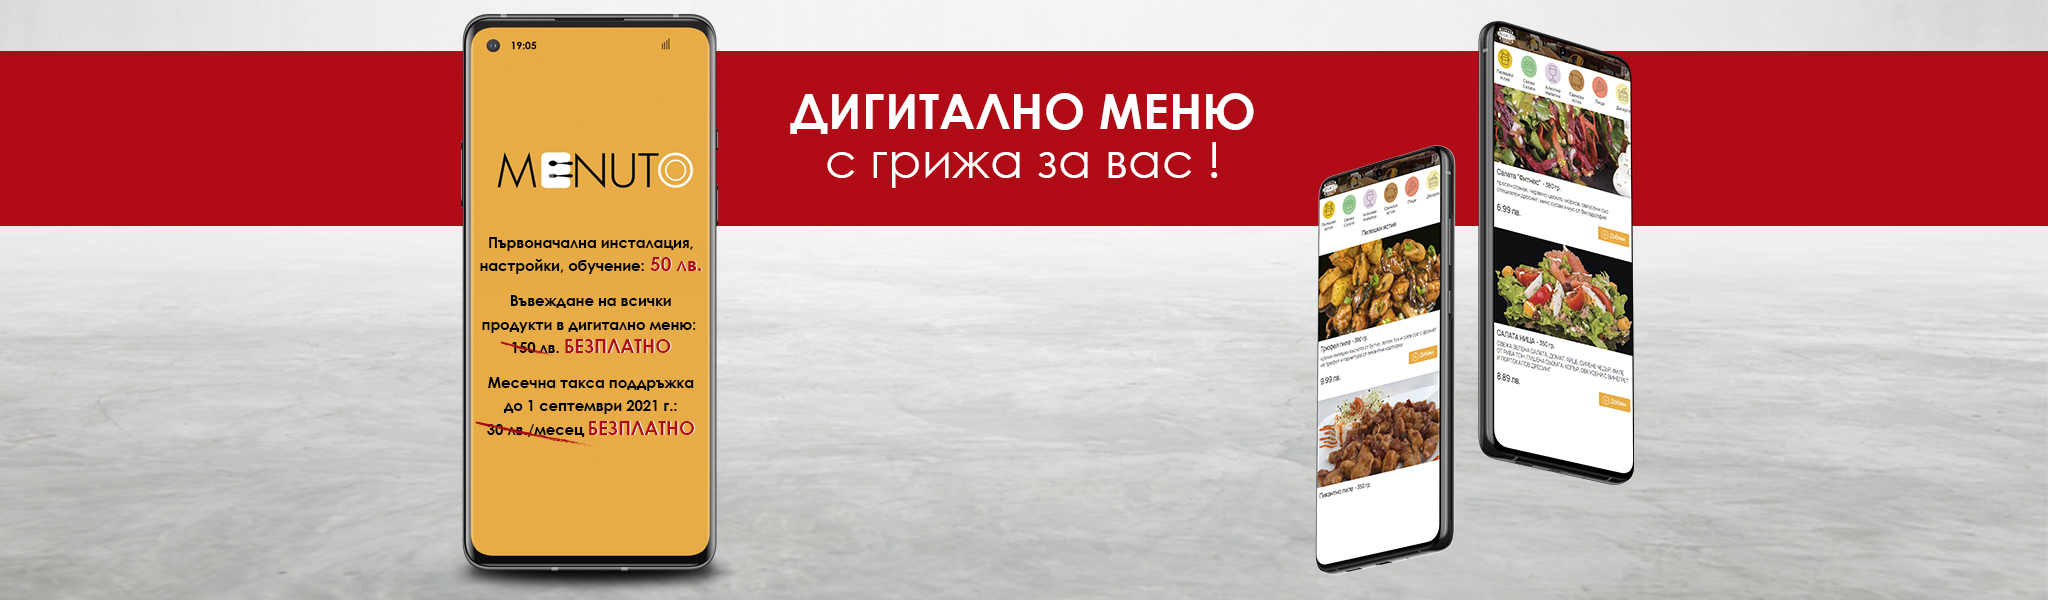 menuto.bg